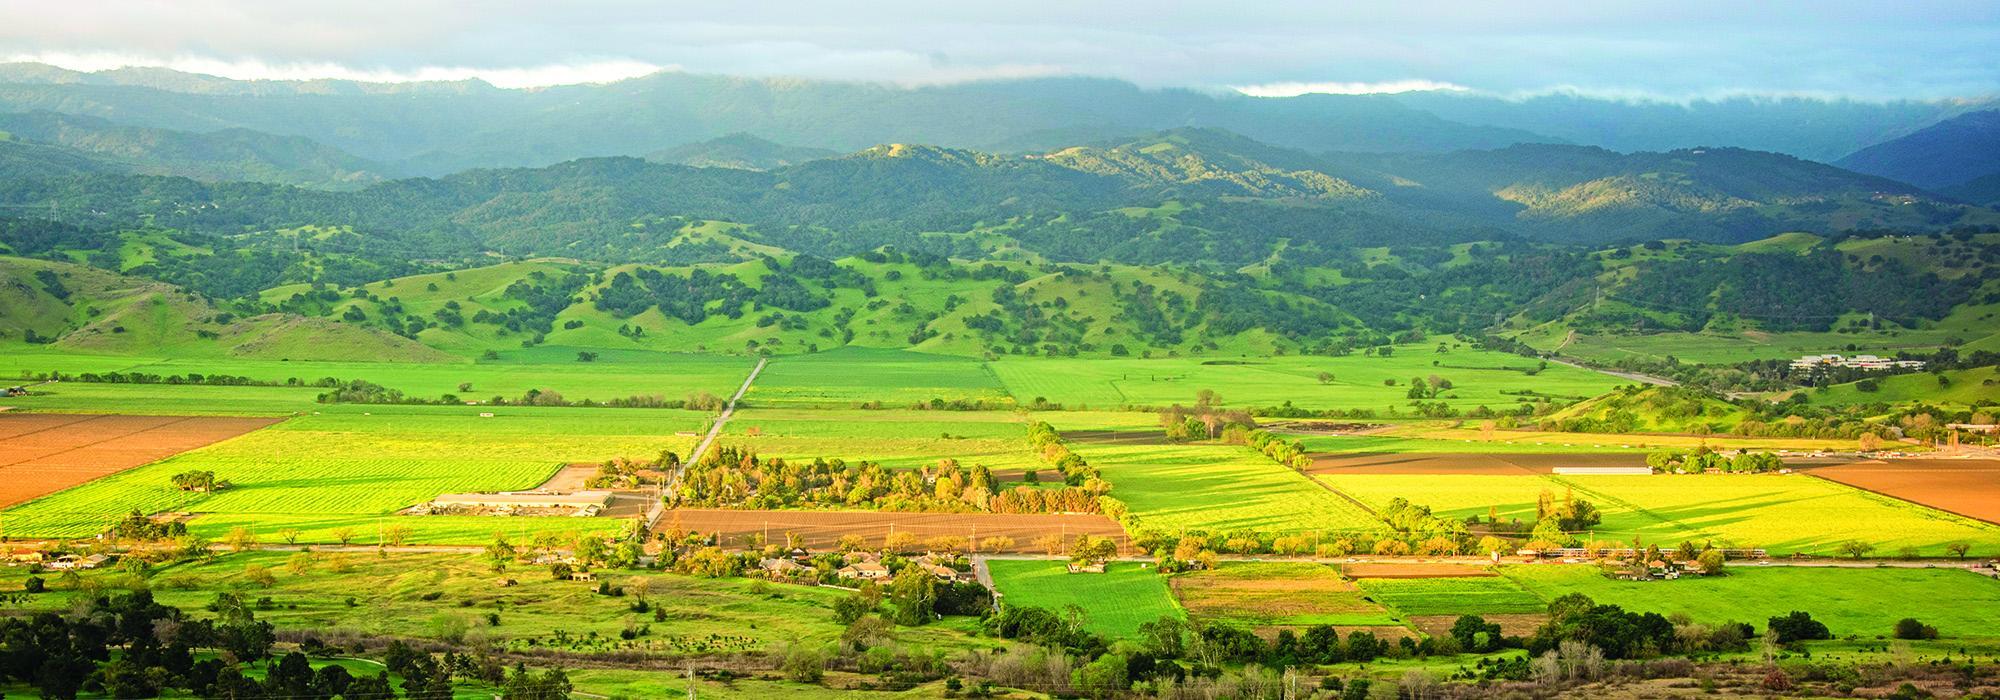 CA_SanJose_CoyoteValley_View of Coyote Valley Santa Clara Valley Open Space Authority_byDerek Neumann_2015_Hero.jpg